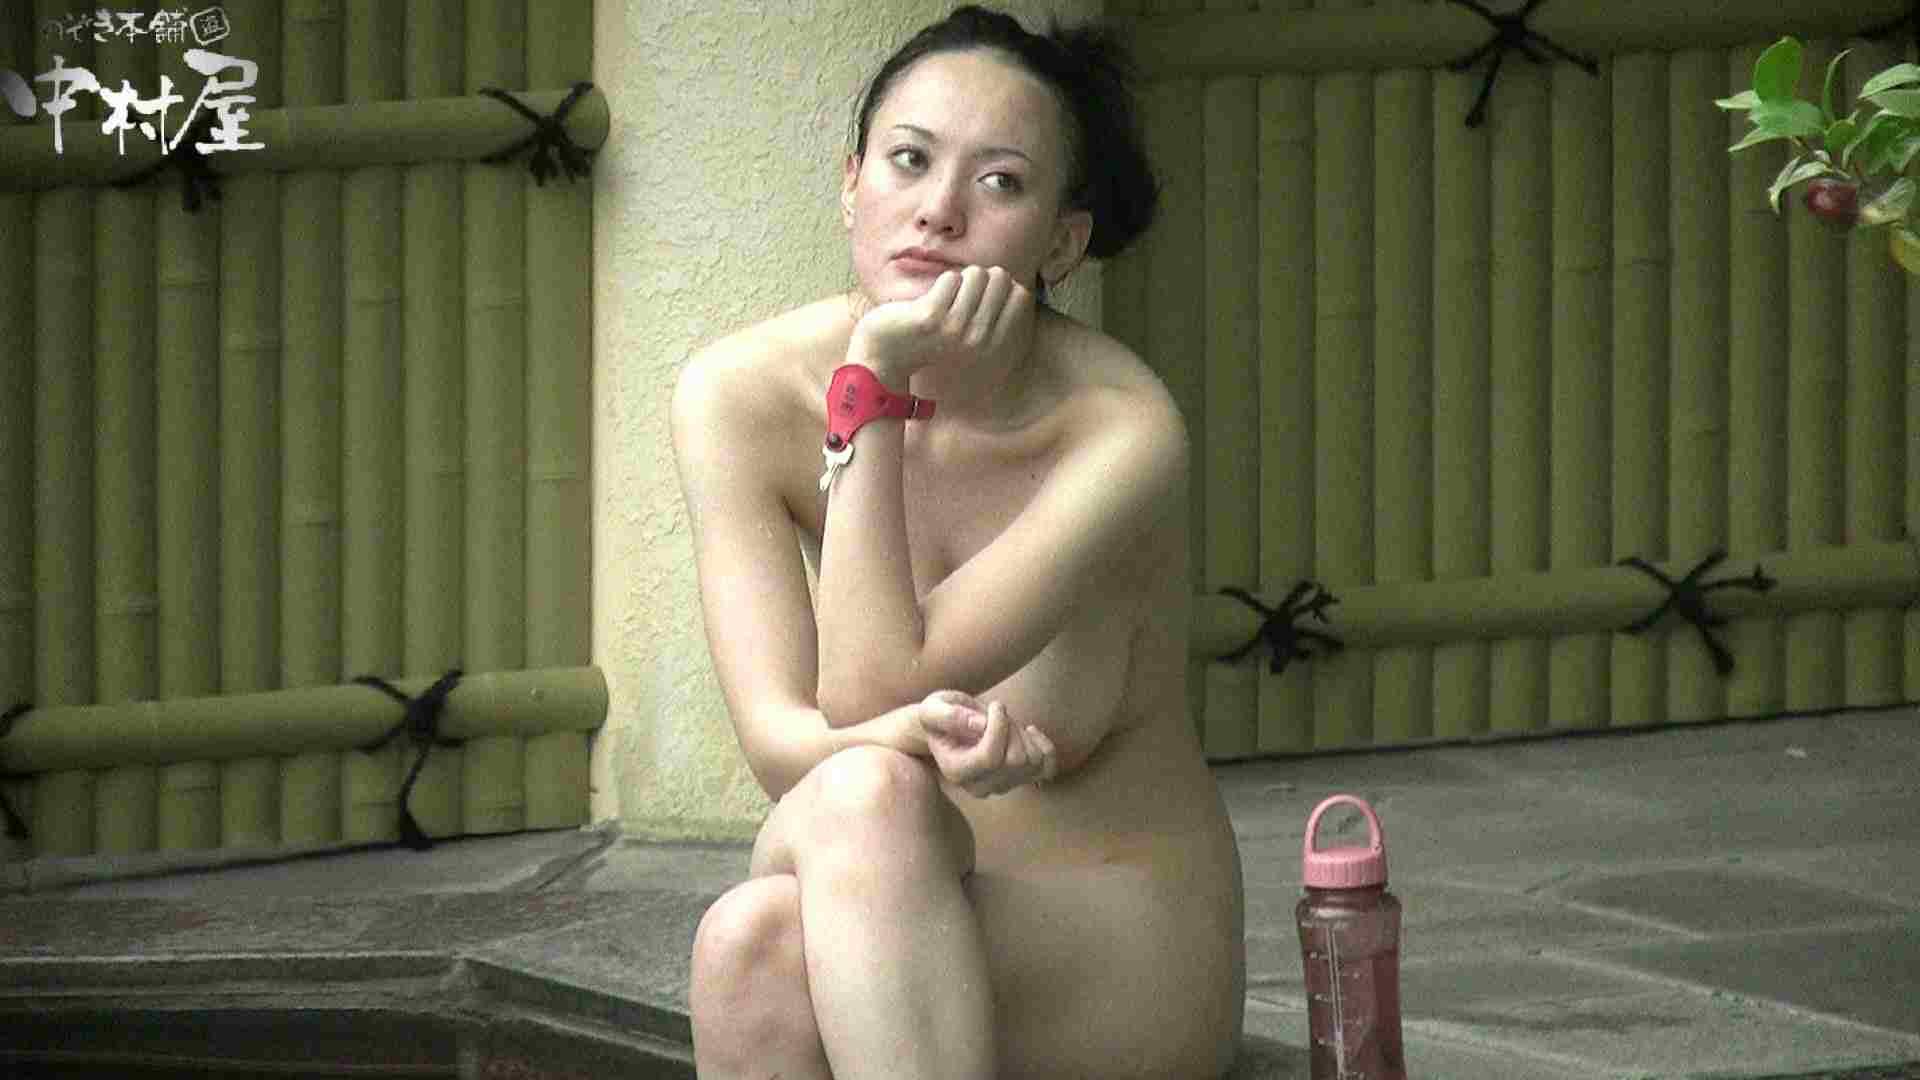 Aquaな露天風呂Vol.903 美しいOLの裸体 オメコ動画キャプチャ 98pic 14